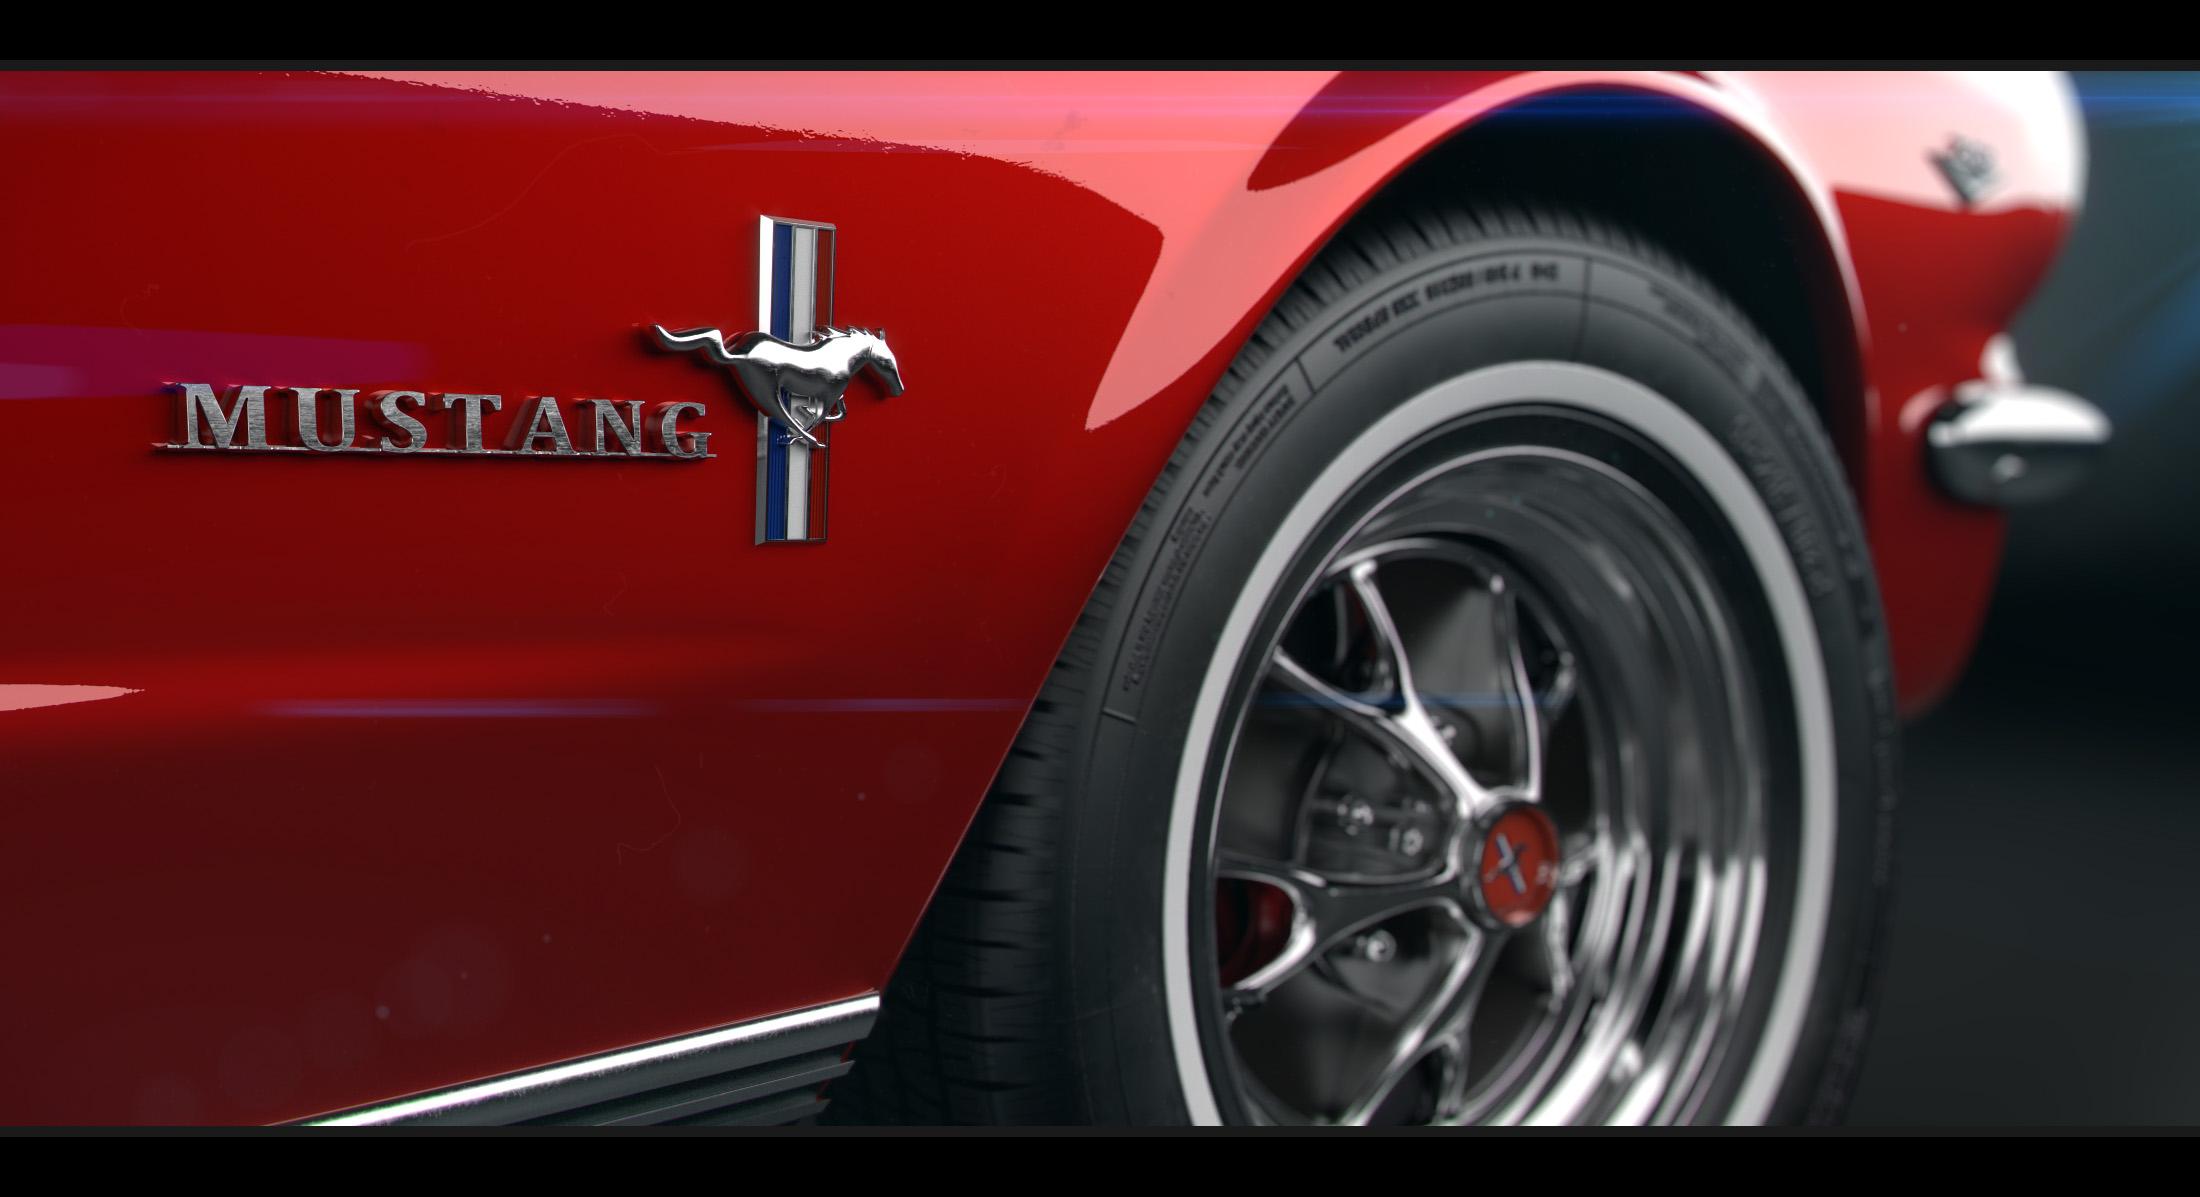 Mustang - 14